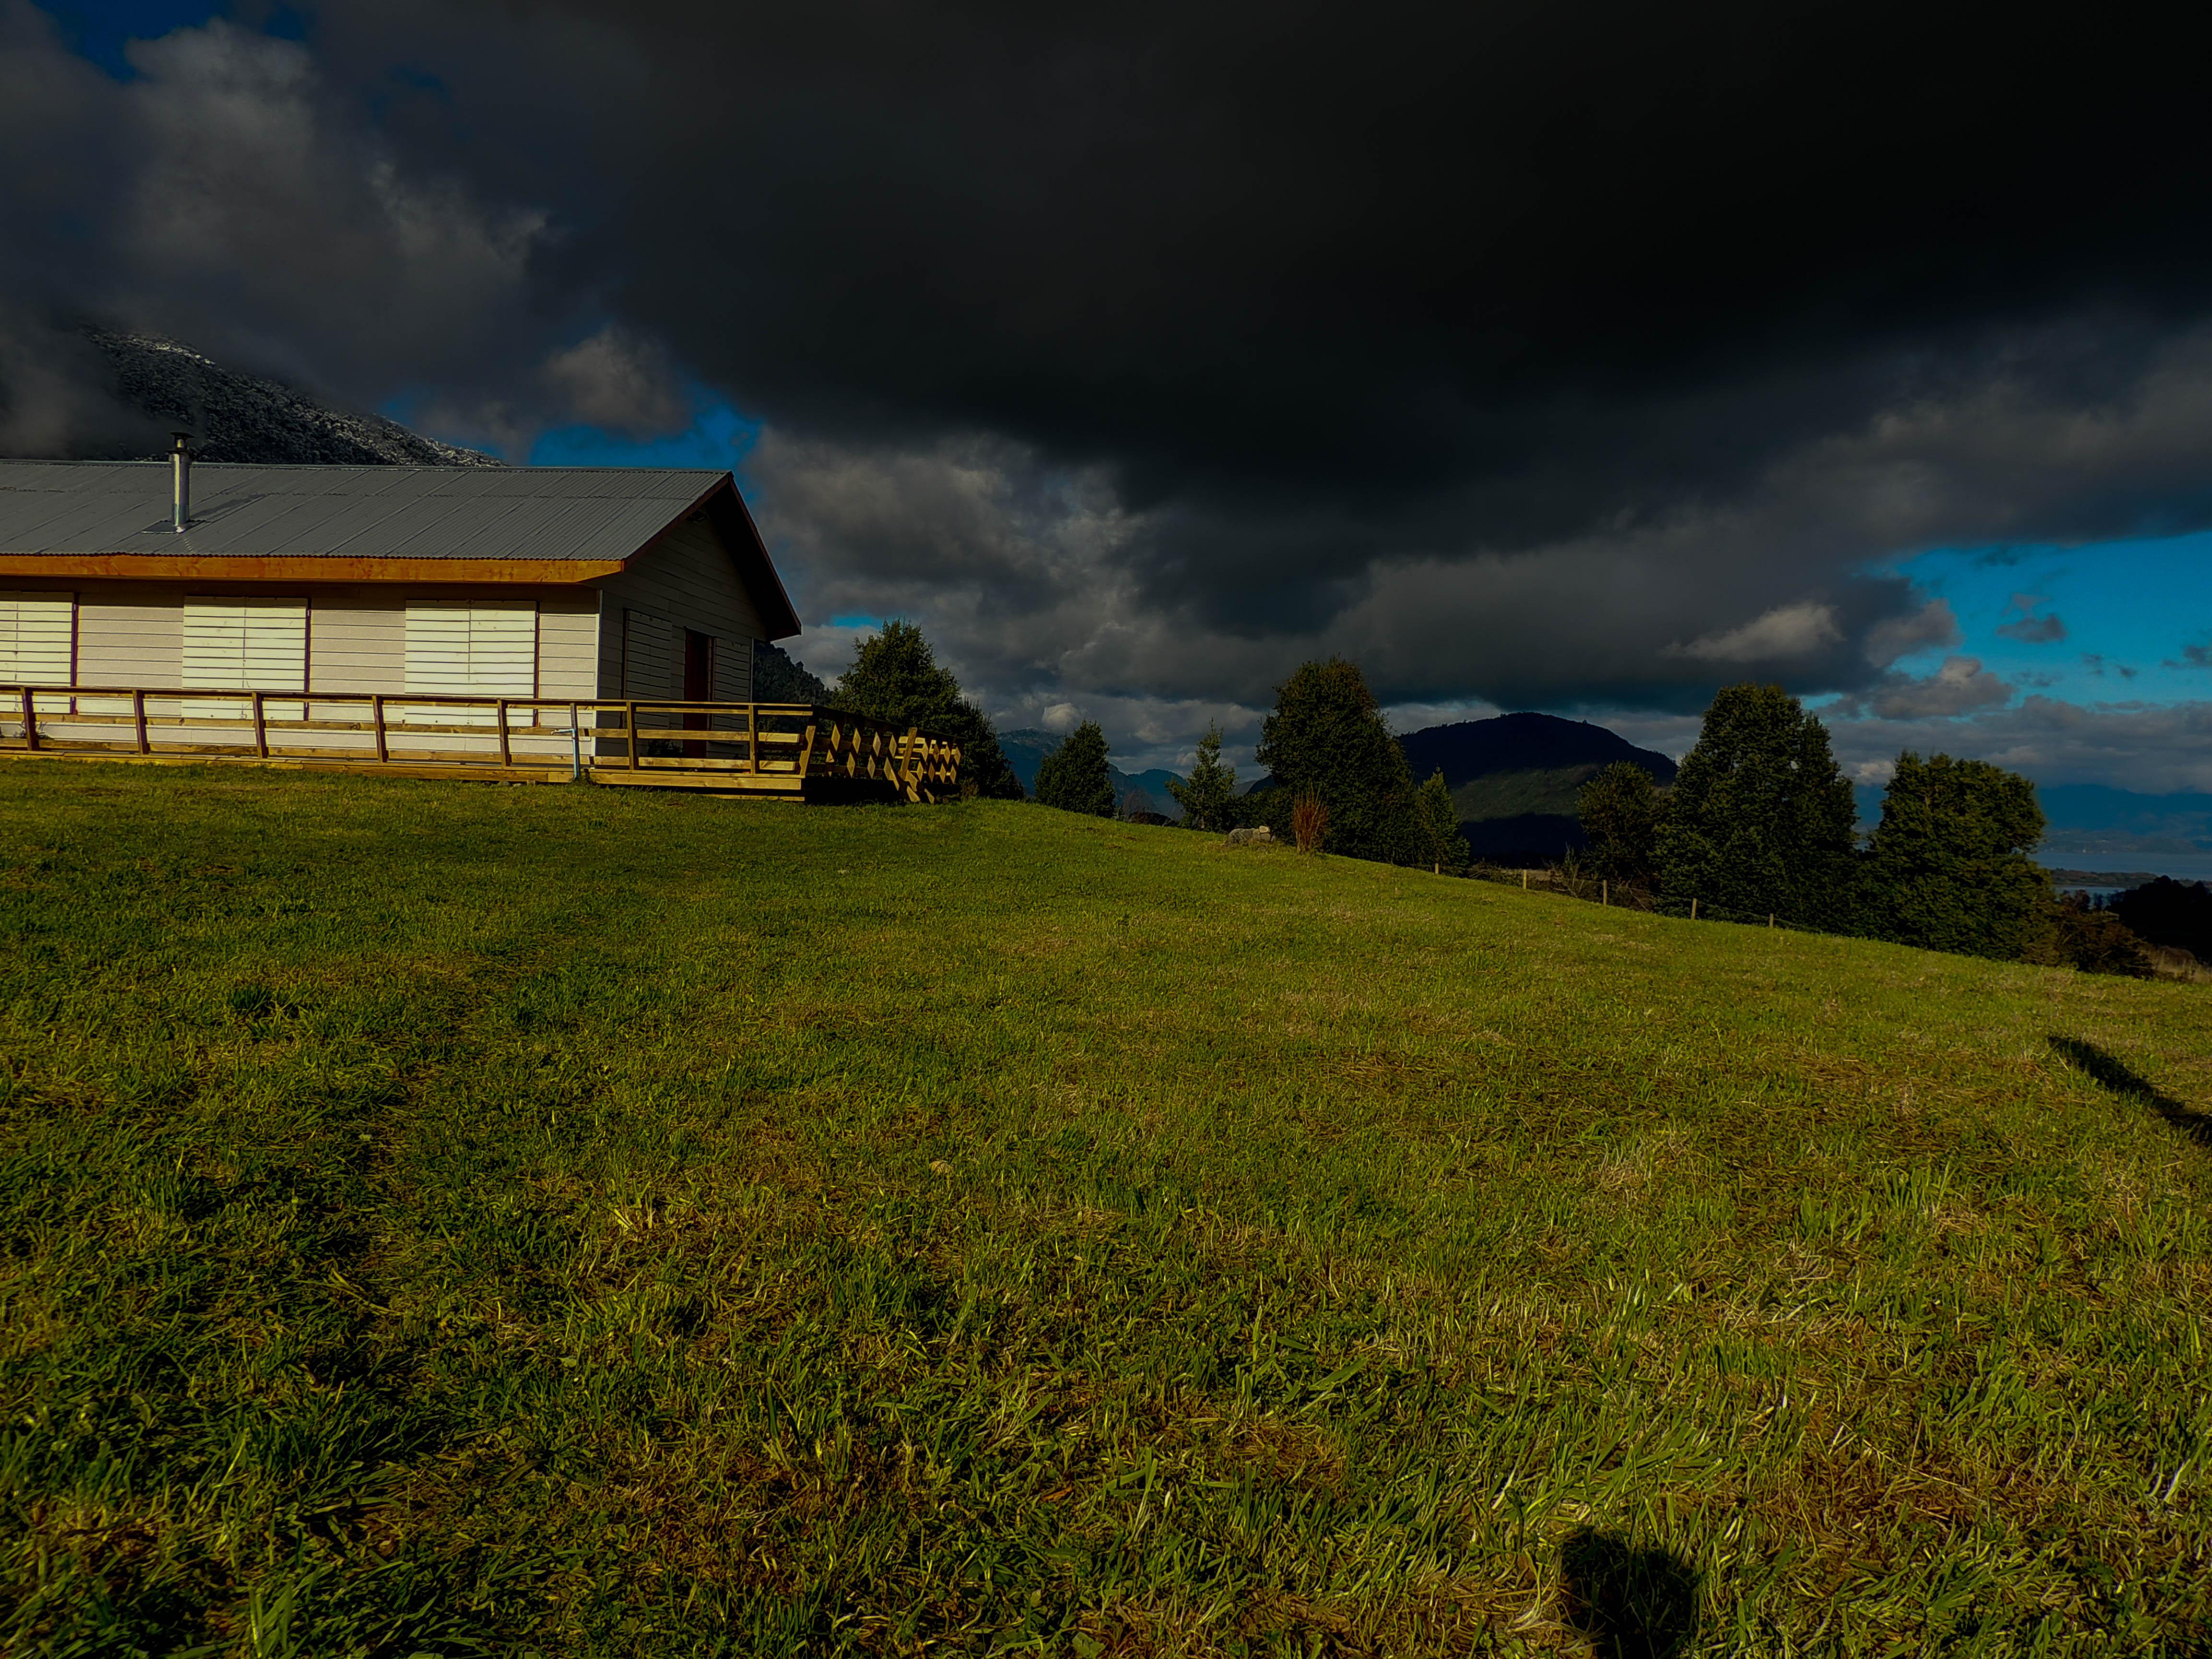 Futrono Lindo Proyecto Paisaj Stico Paisajismo Sur De Chile  # Muebles Futrono